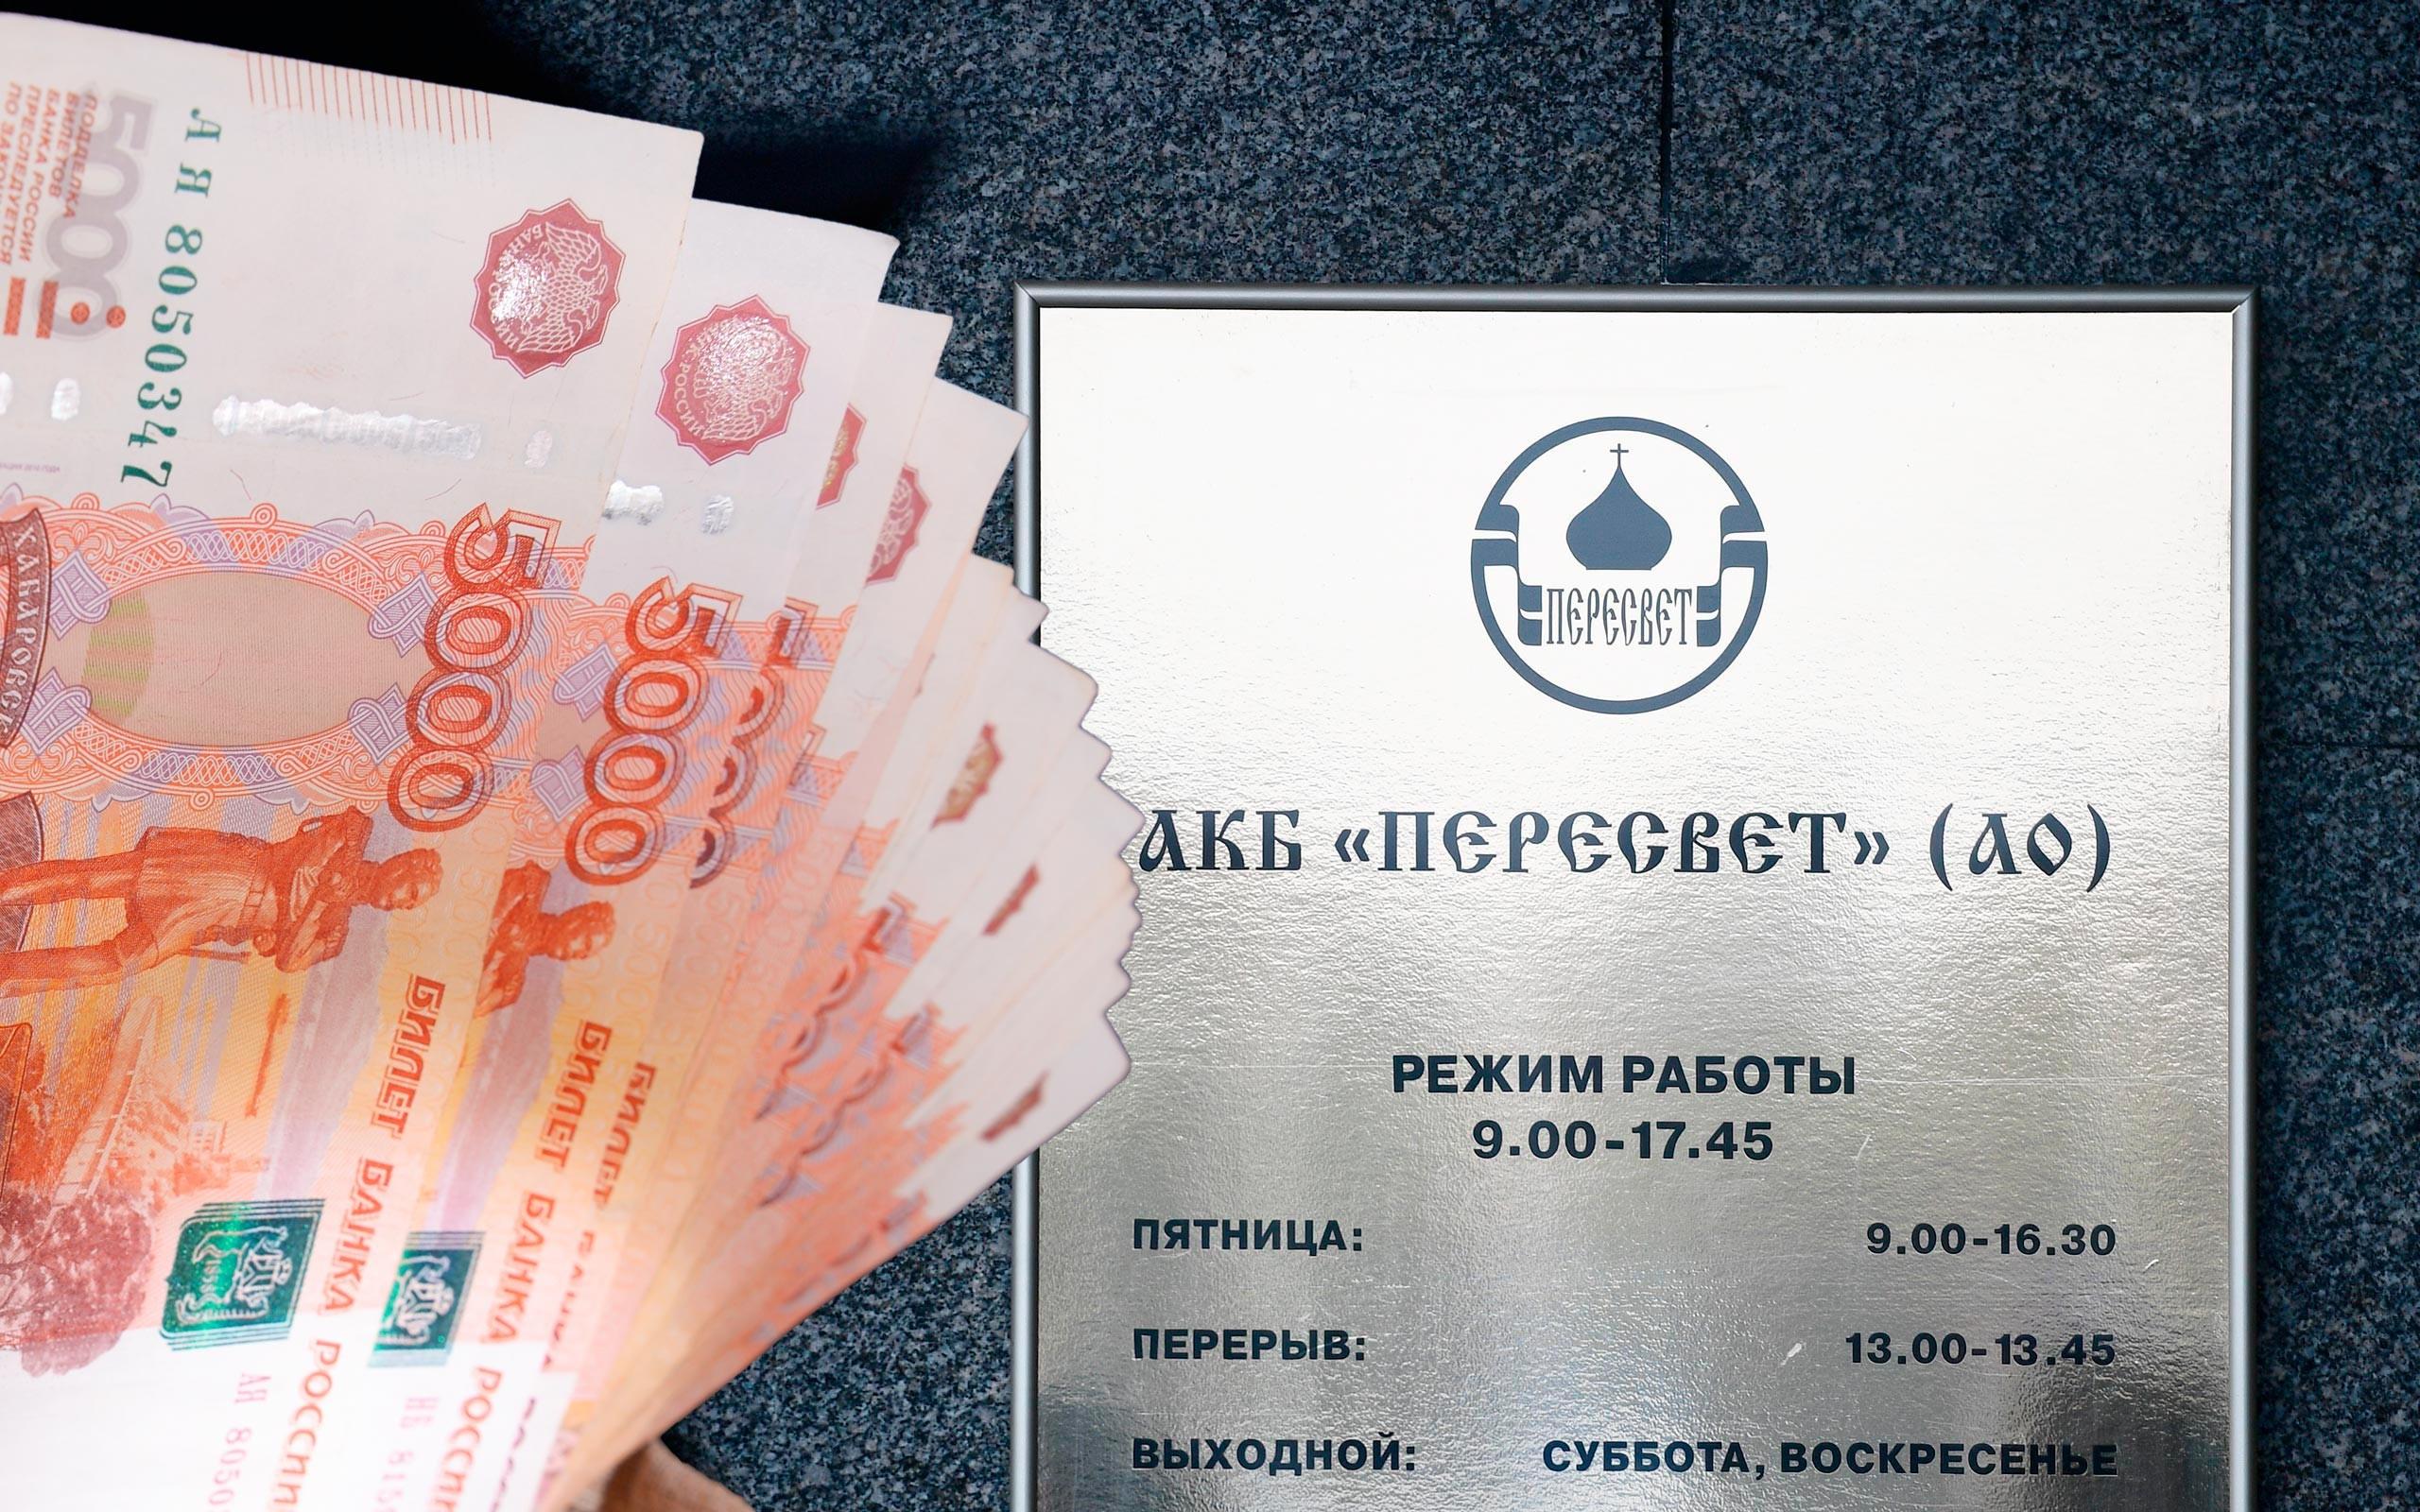 <p>Коллаж &copy; L!FE. Фото: &copy; РИА Новости/Рамиль Ситдиков/Владимир Трефилов</p>